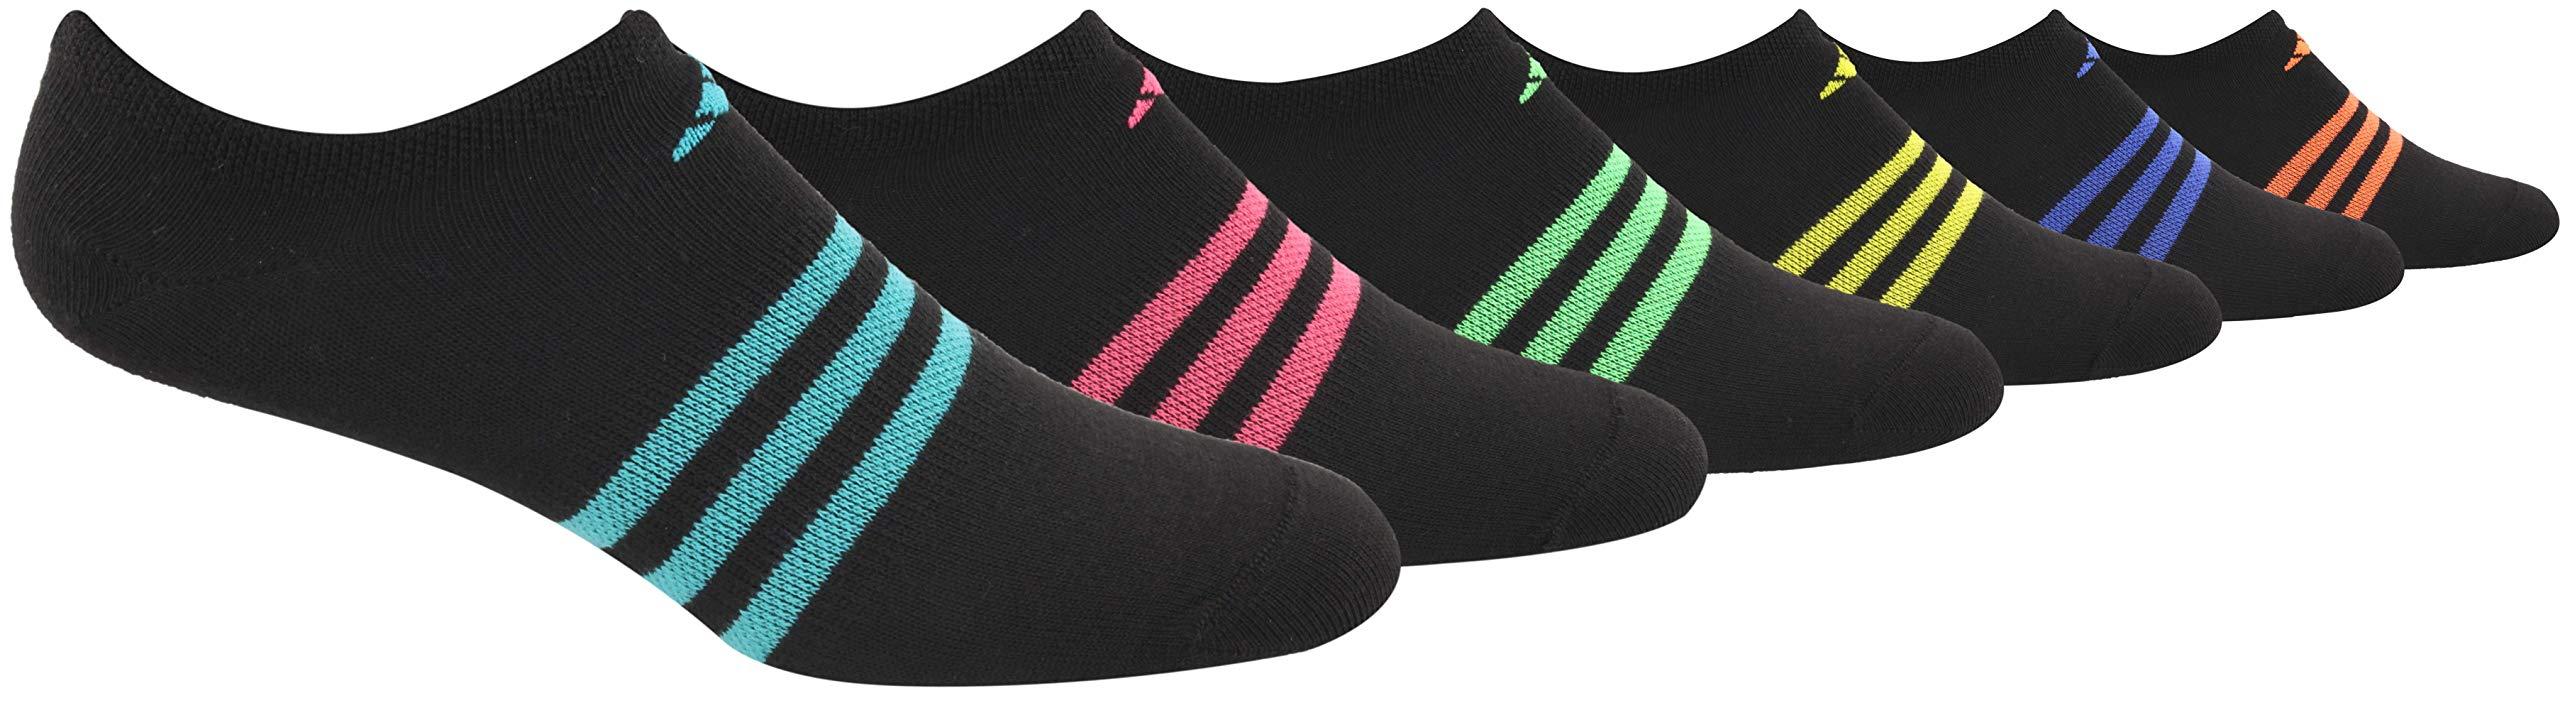 adidas Women's Superlite No Show Socks (6-Pair), Black/Hi - Res Aqua Green/Real Pink/Shock Lime Green, Medium, (Shoe Size 5-10) by adidas